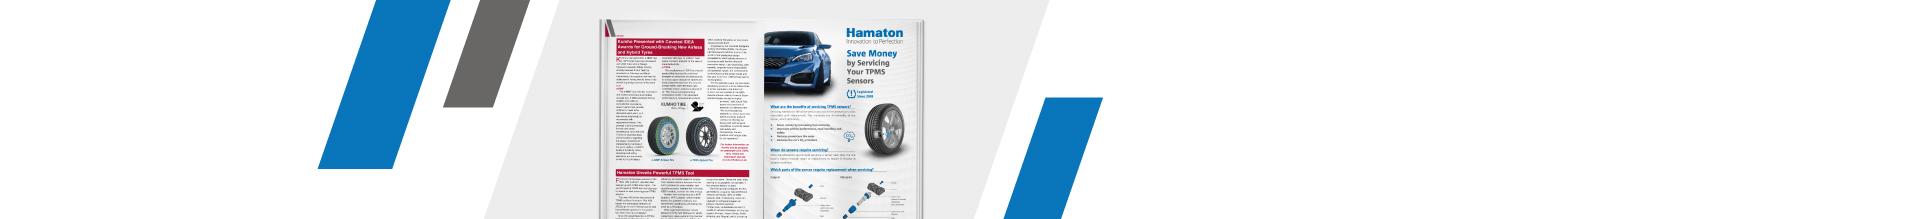 Hamaton Ltd News